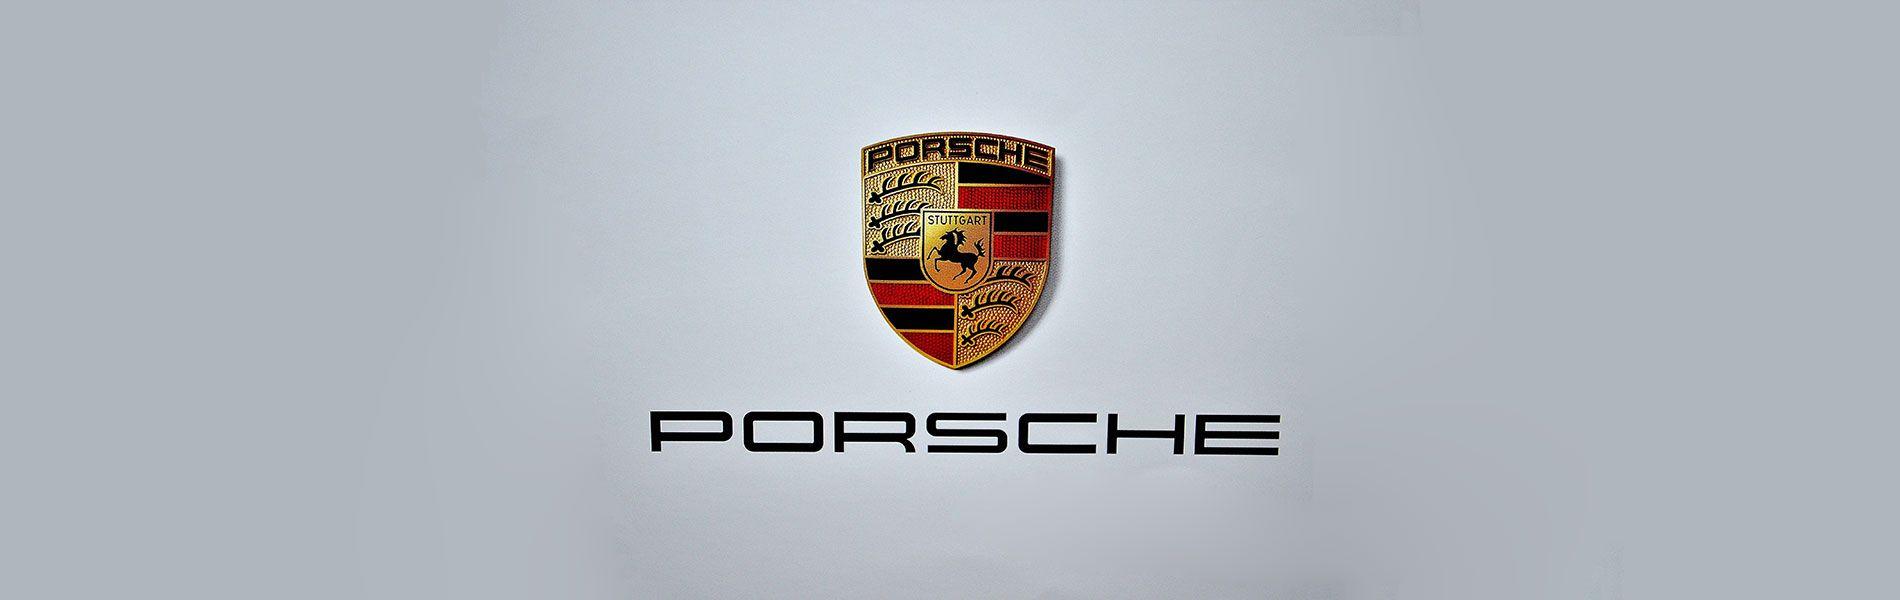 Porsche 911 - მე ვარ ლეგენდა